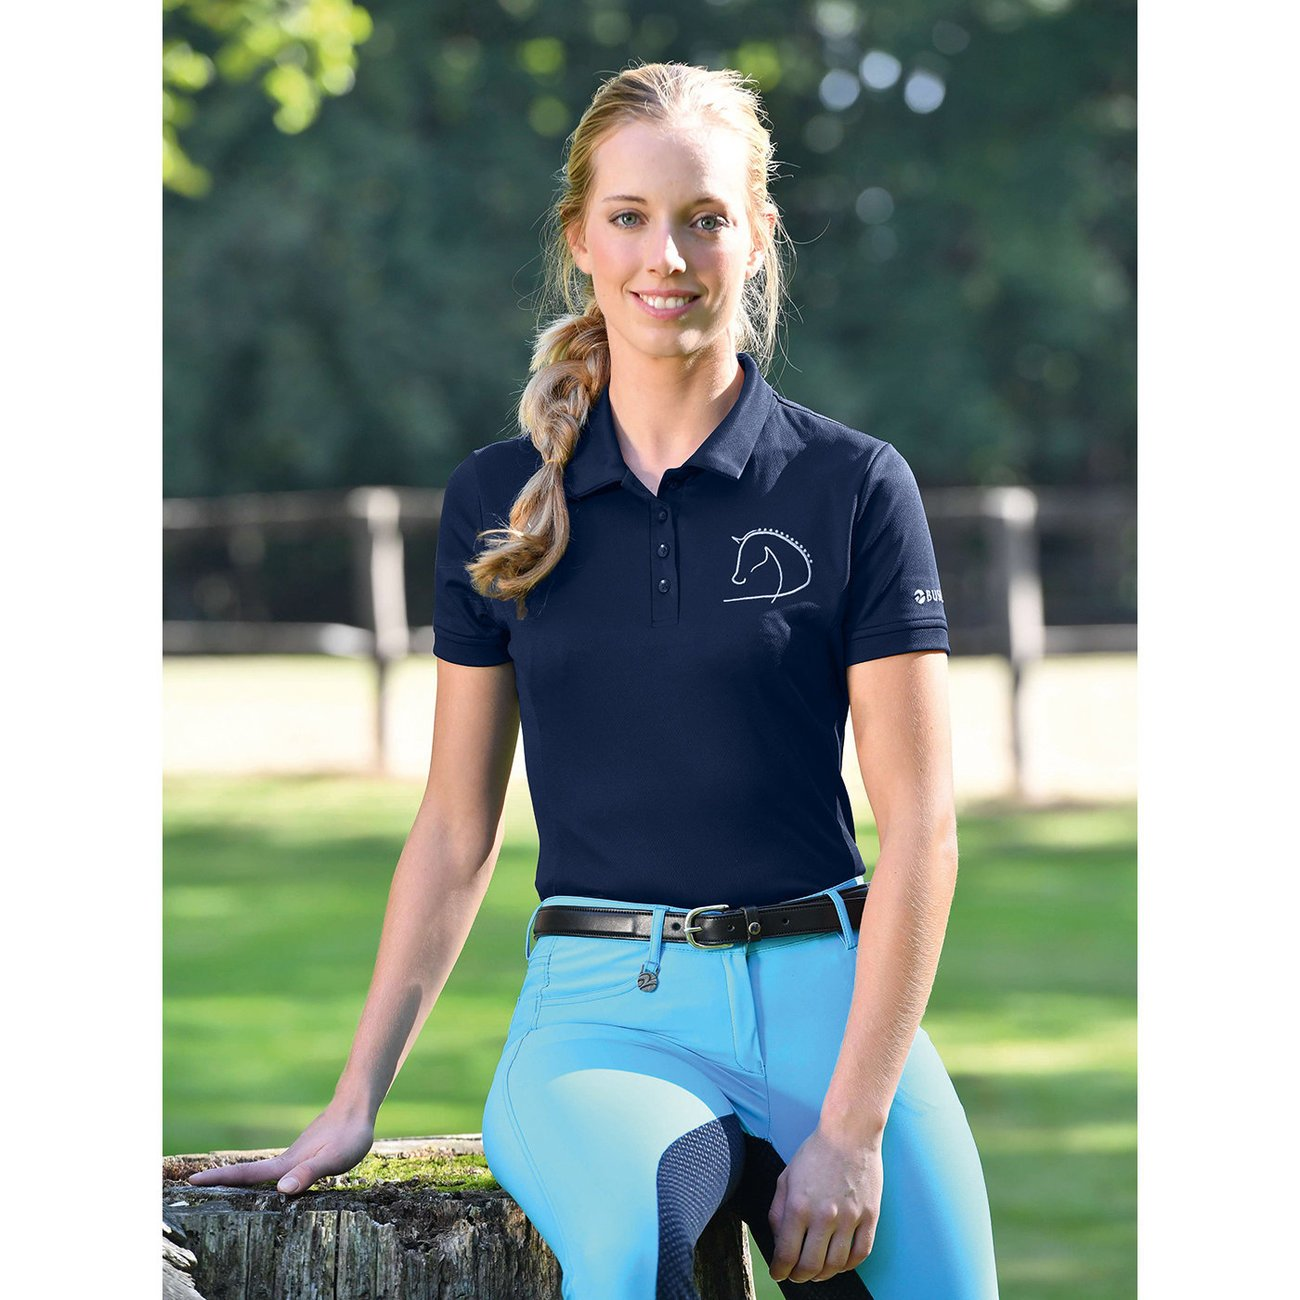 BUSSE Polo Shirt Crew, Bild 4